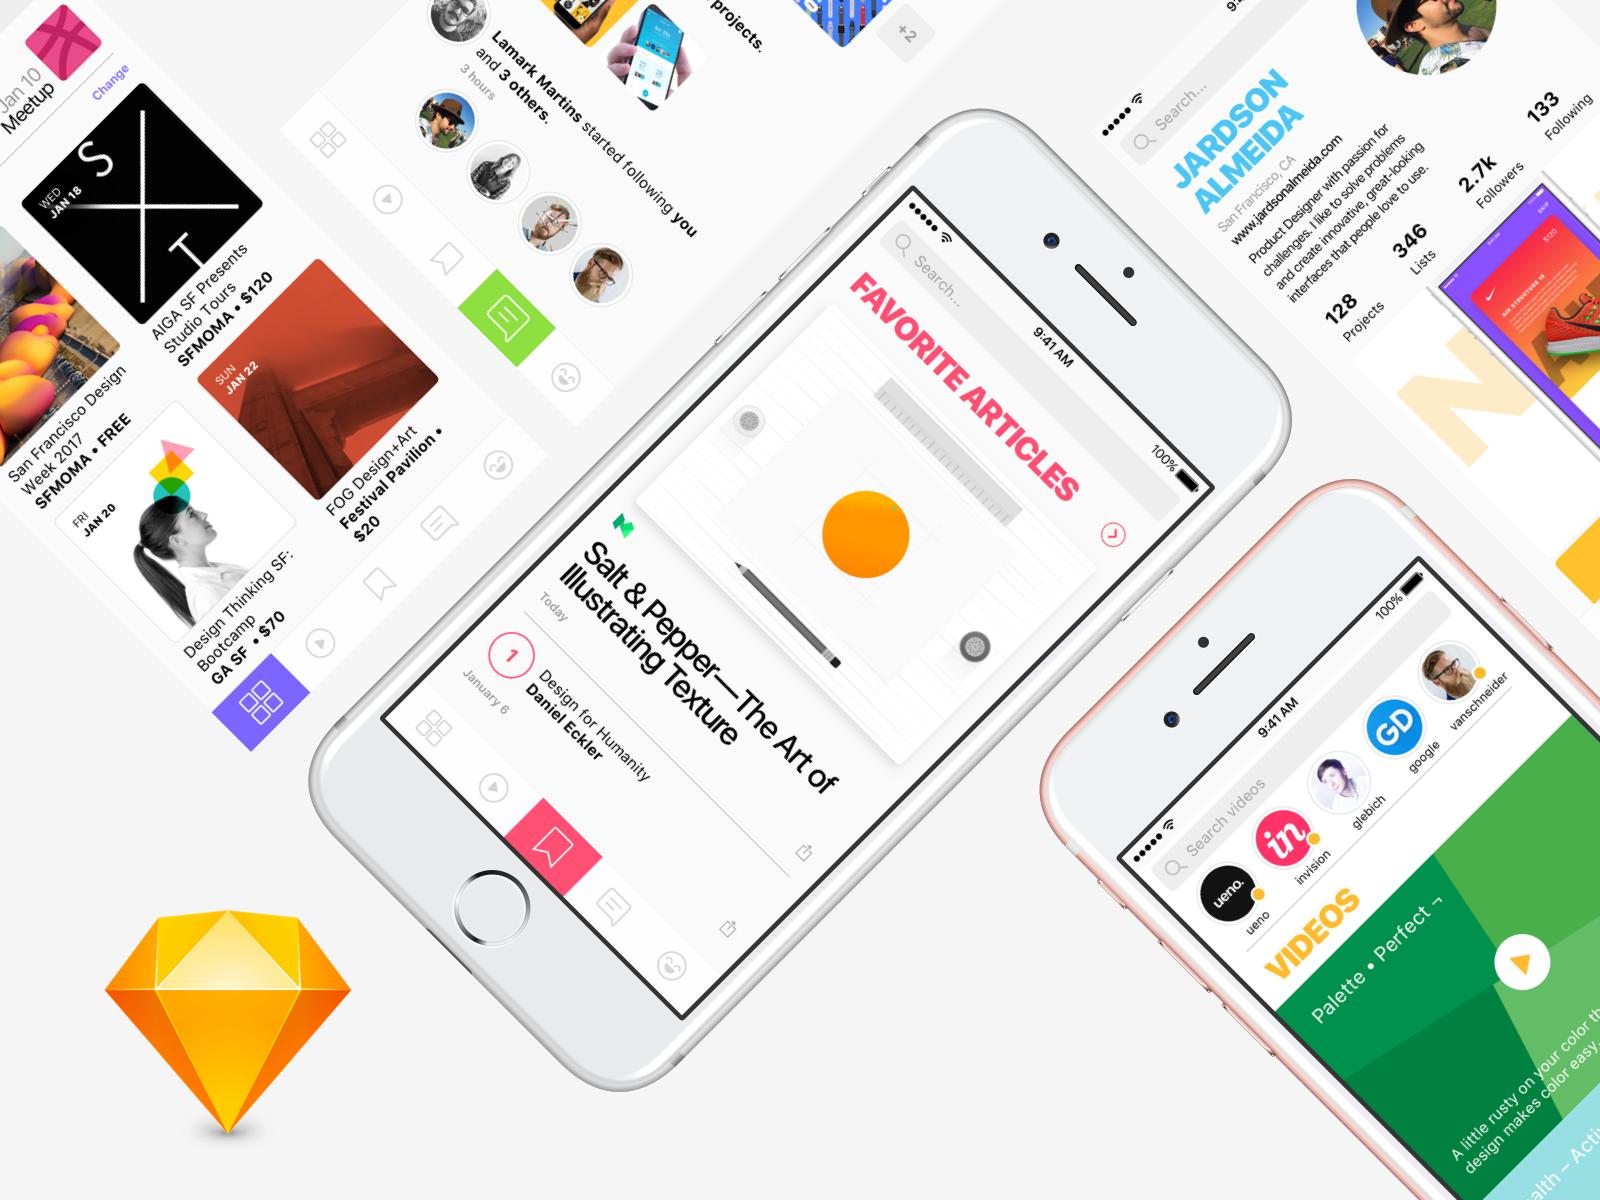 Social Network App Design Concept - 5 Free Screens for Sketch community